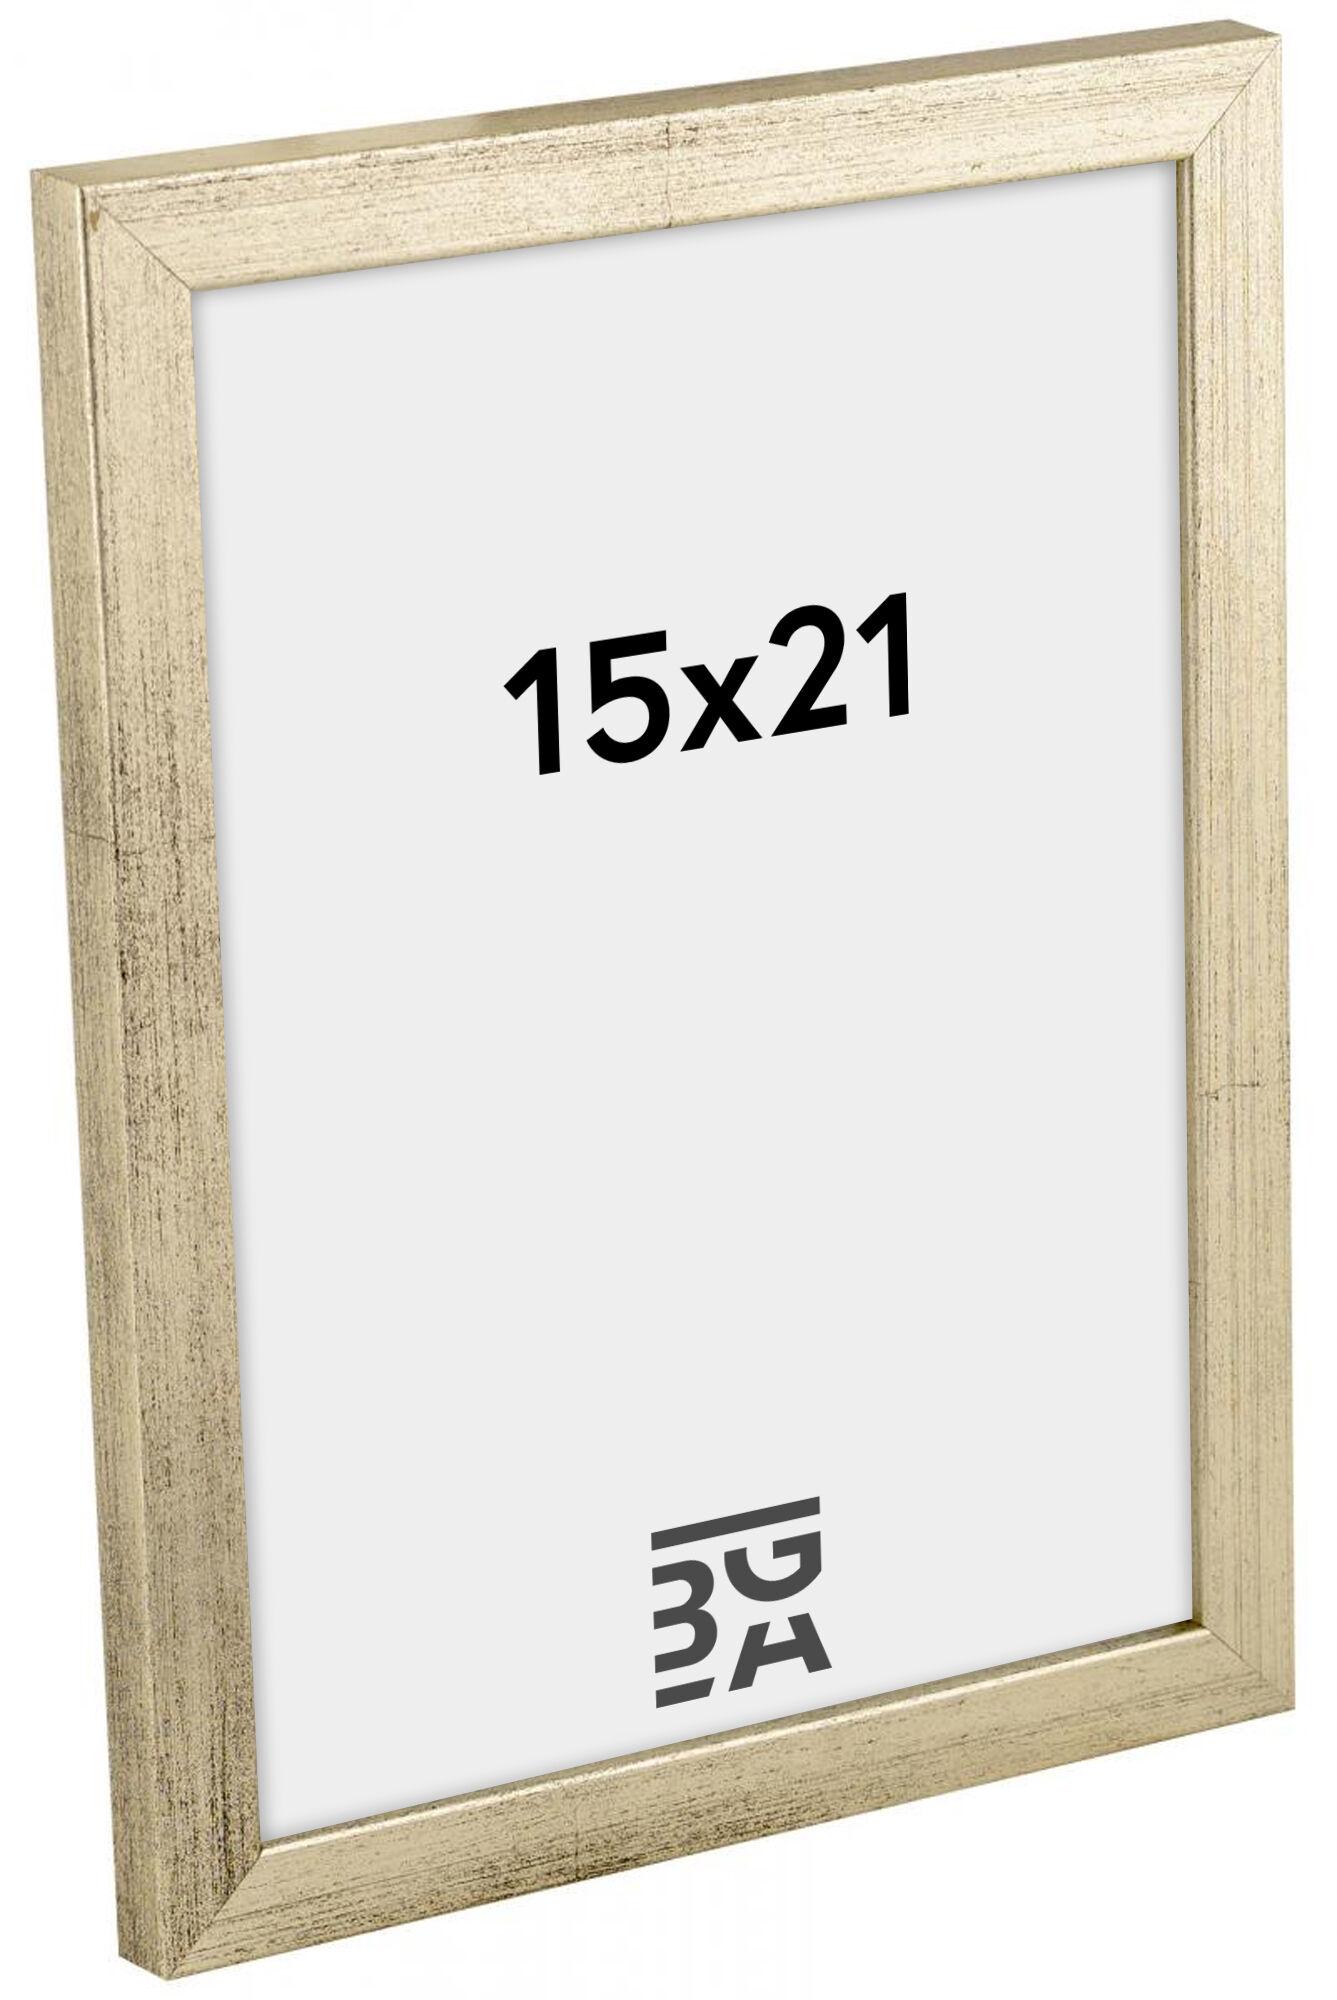 Estancia Galant Hopeanvärinen 15x21 cm (A5)